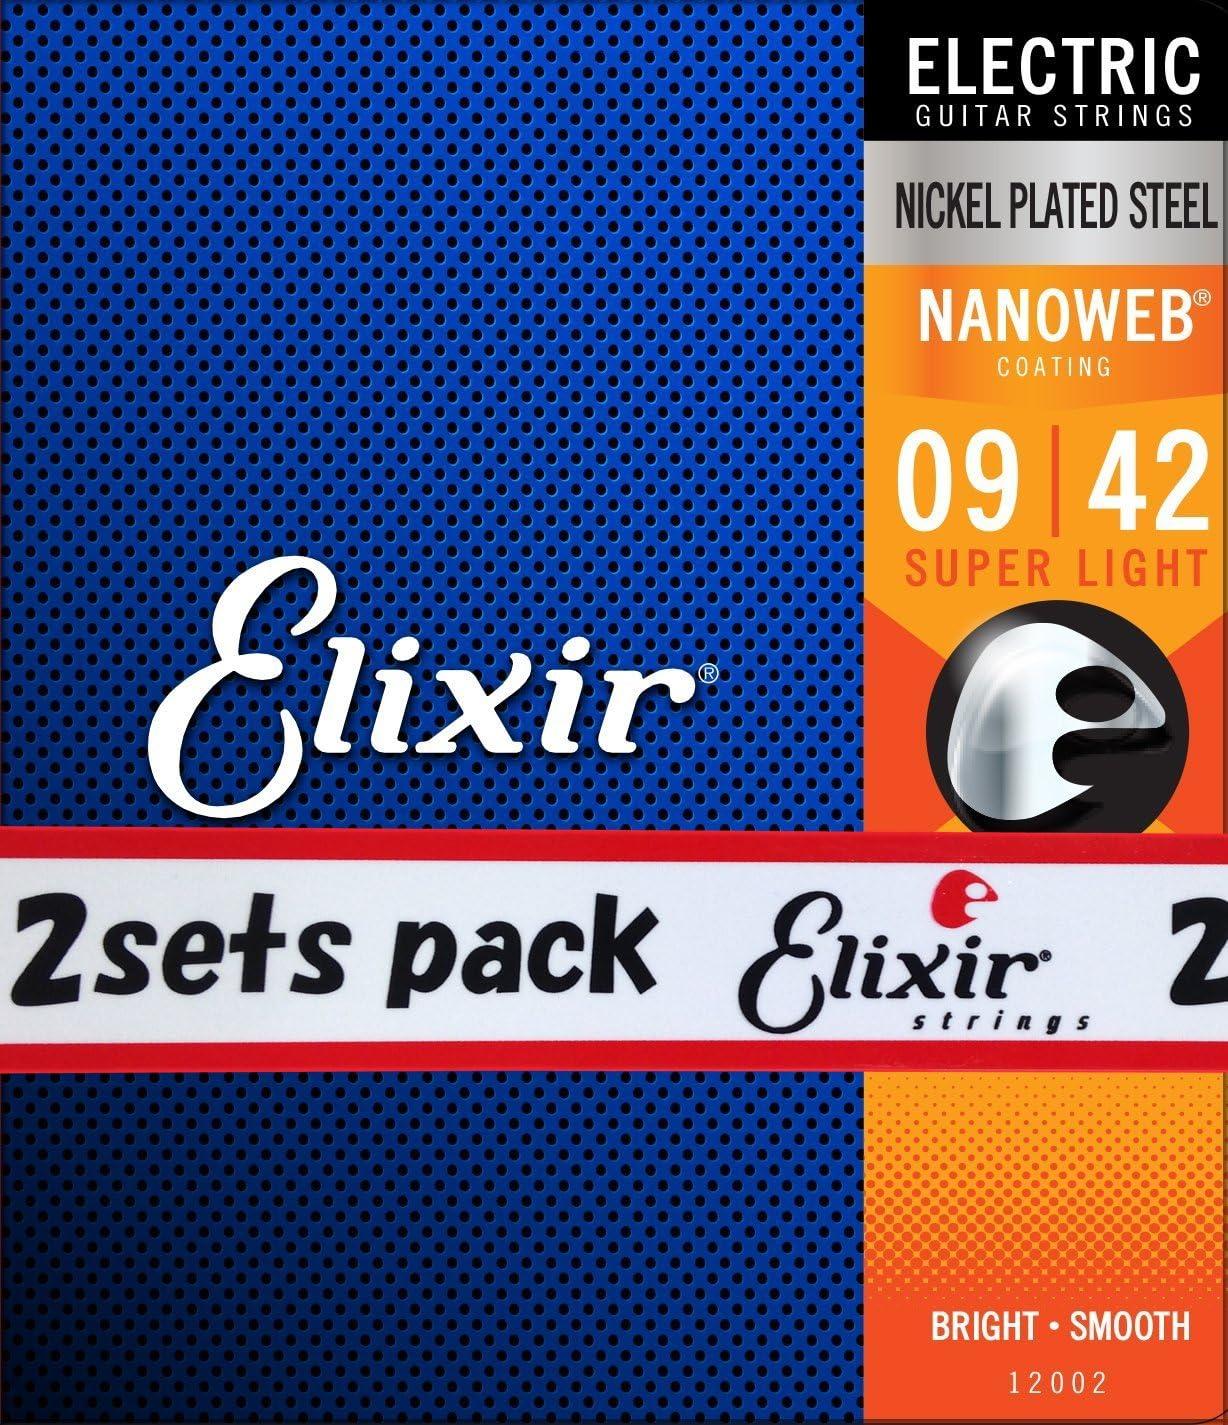 Lite Elixir Nanoweb Electric Guitar Strings 3 Pack Super Light